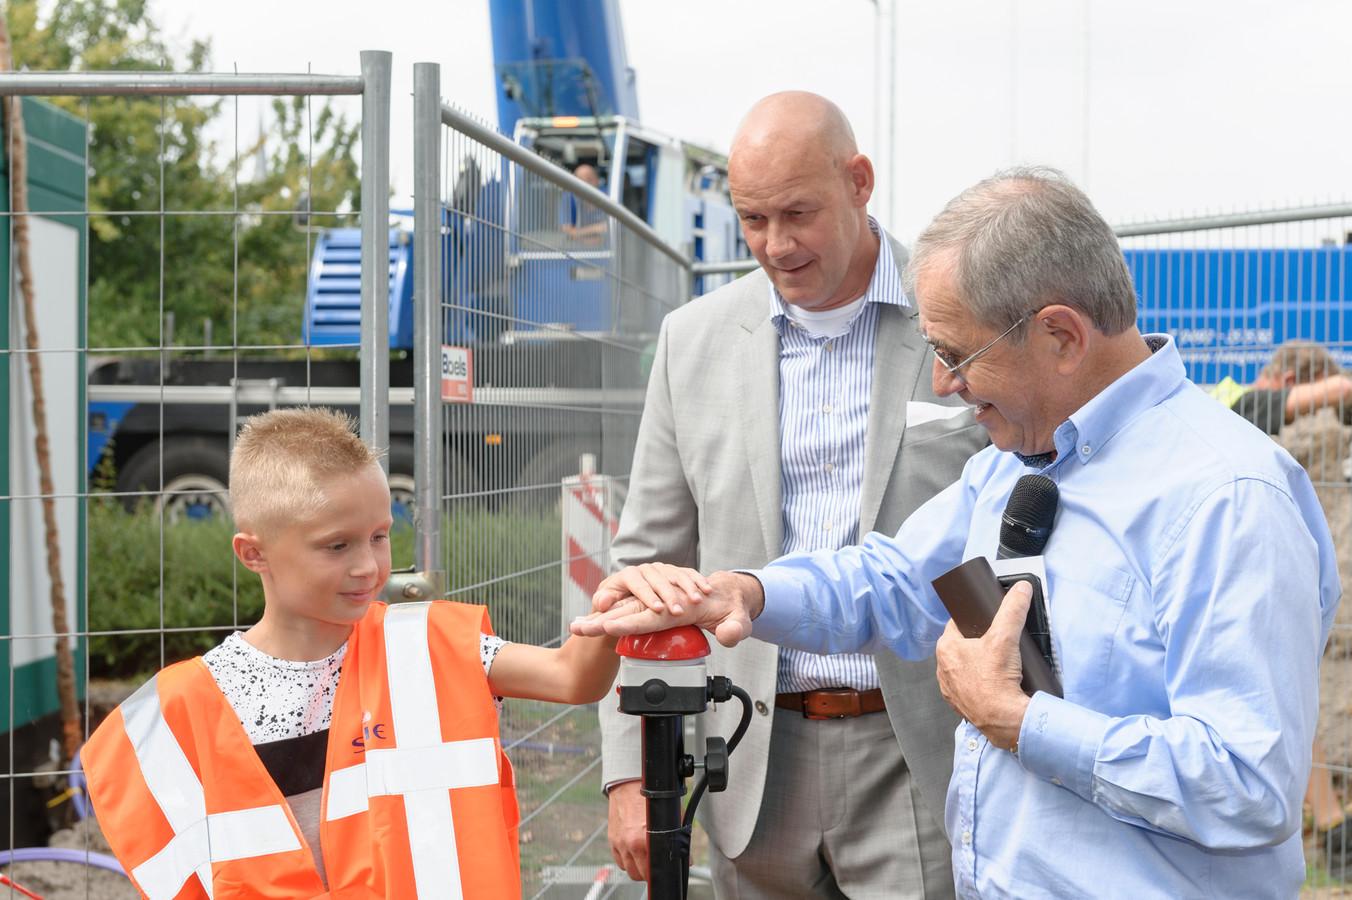 Wethouder Raemaekers en Rick geven startsein voor plaatsing glasvezelcentrale in Wanroij.